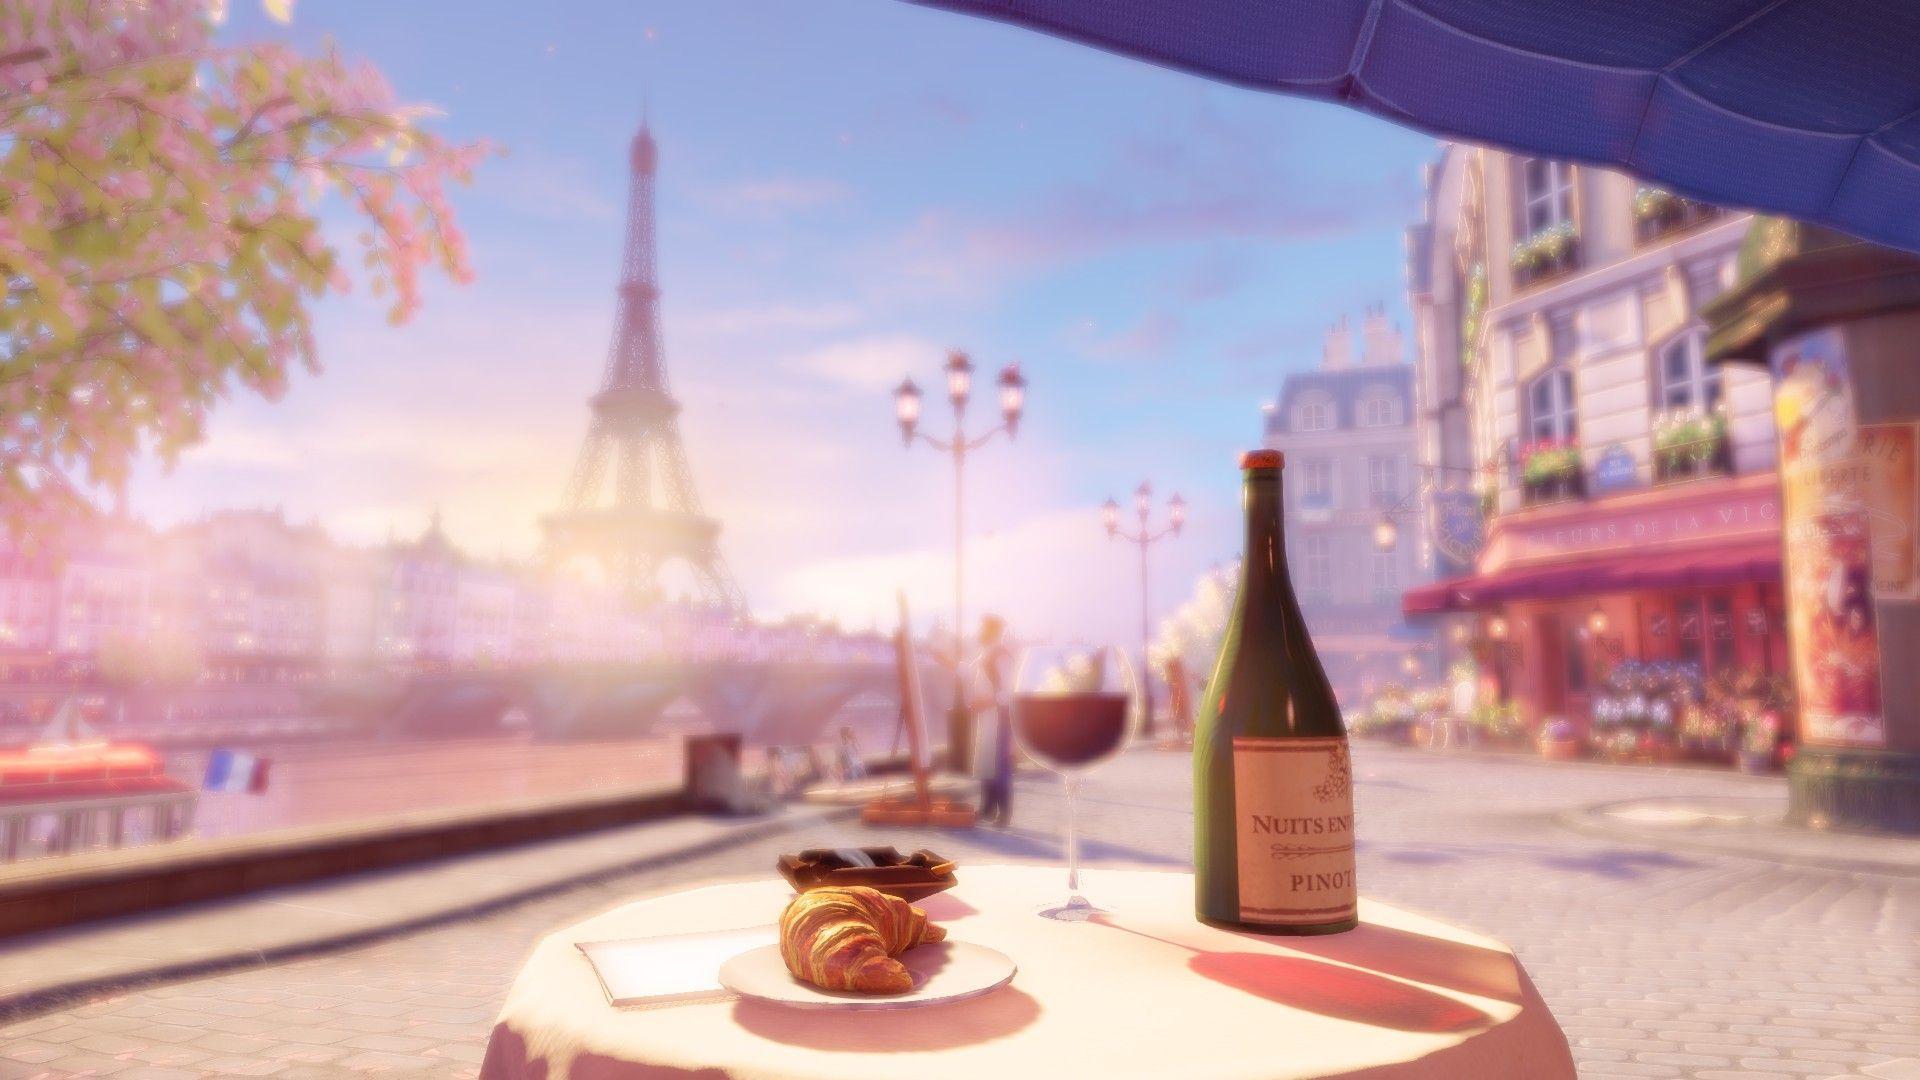 Anime Paris Wallpapers Top Free Anime Paris Backgrounds Wallpaperaccess